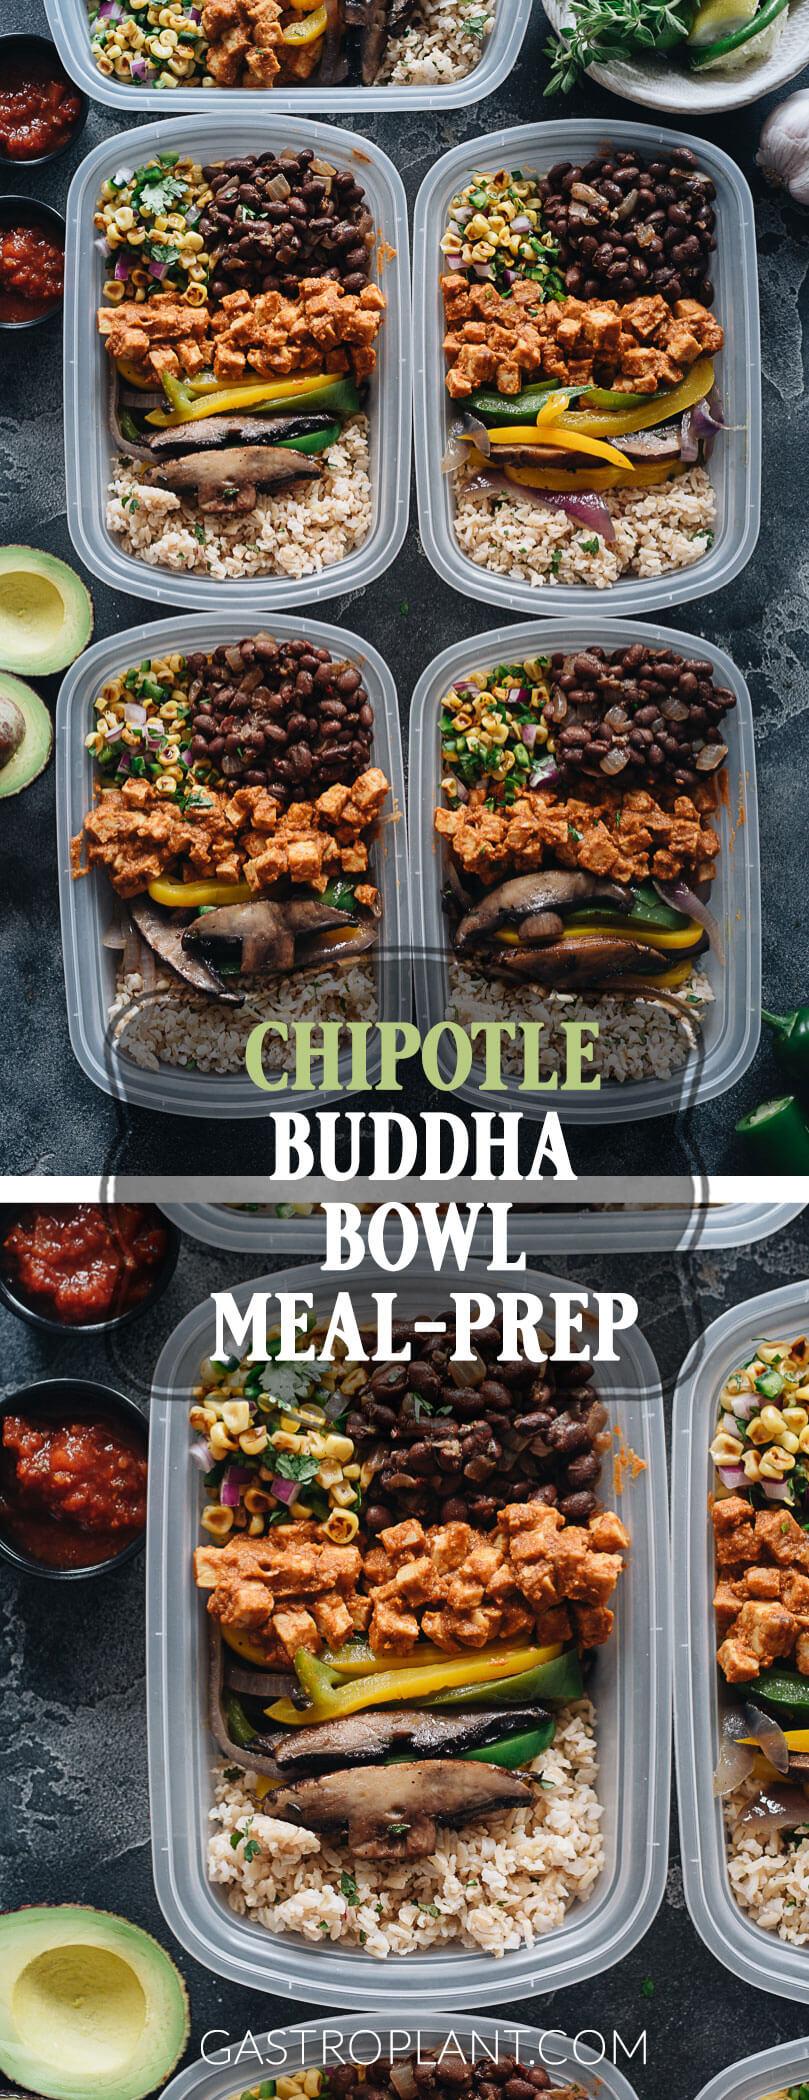 Clean Vegan Chipotle Buddha Bowl Meal Prep with Brown Rice, Mushrooms, Tempeh